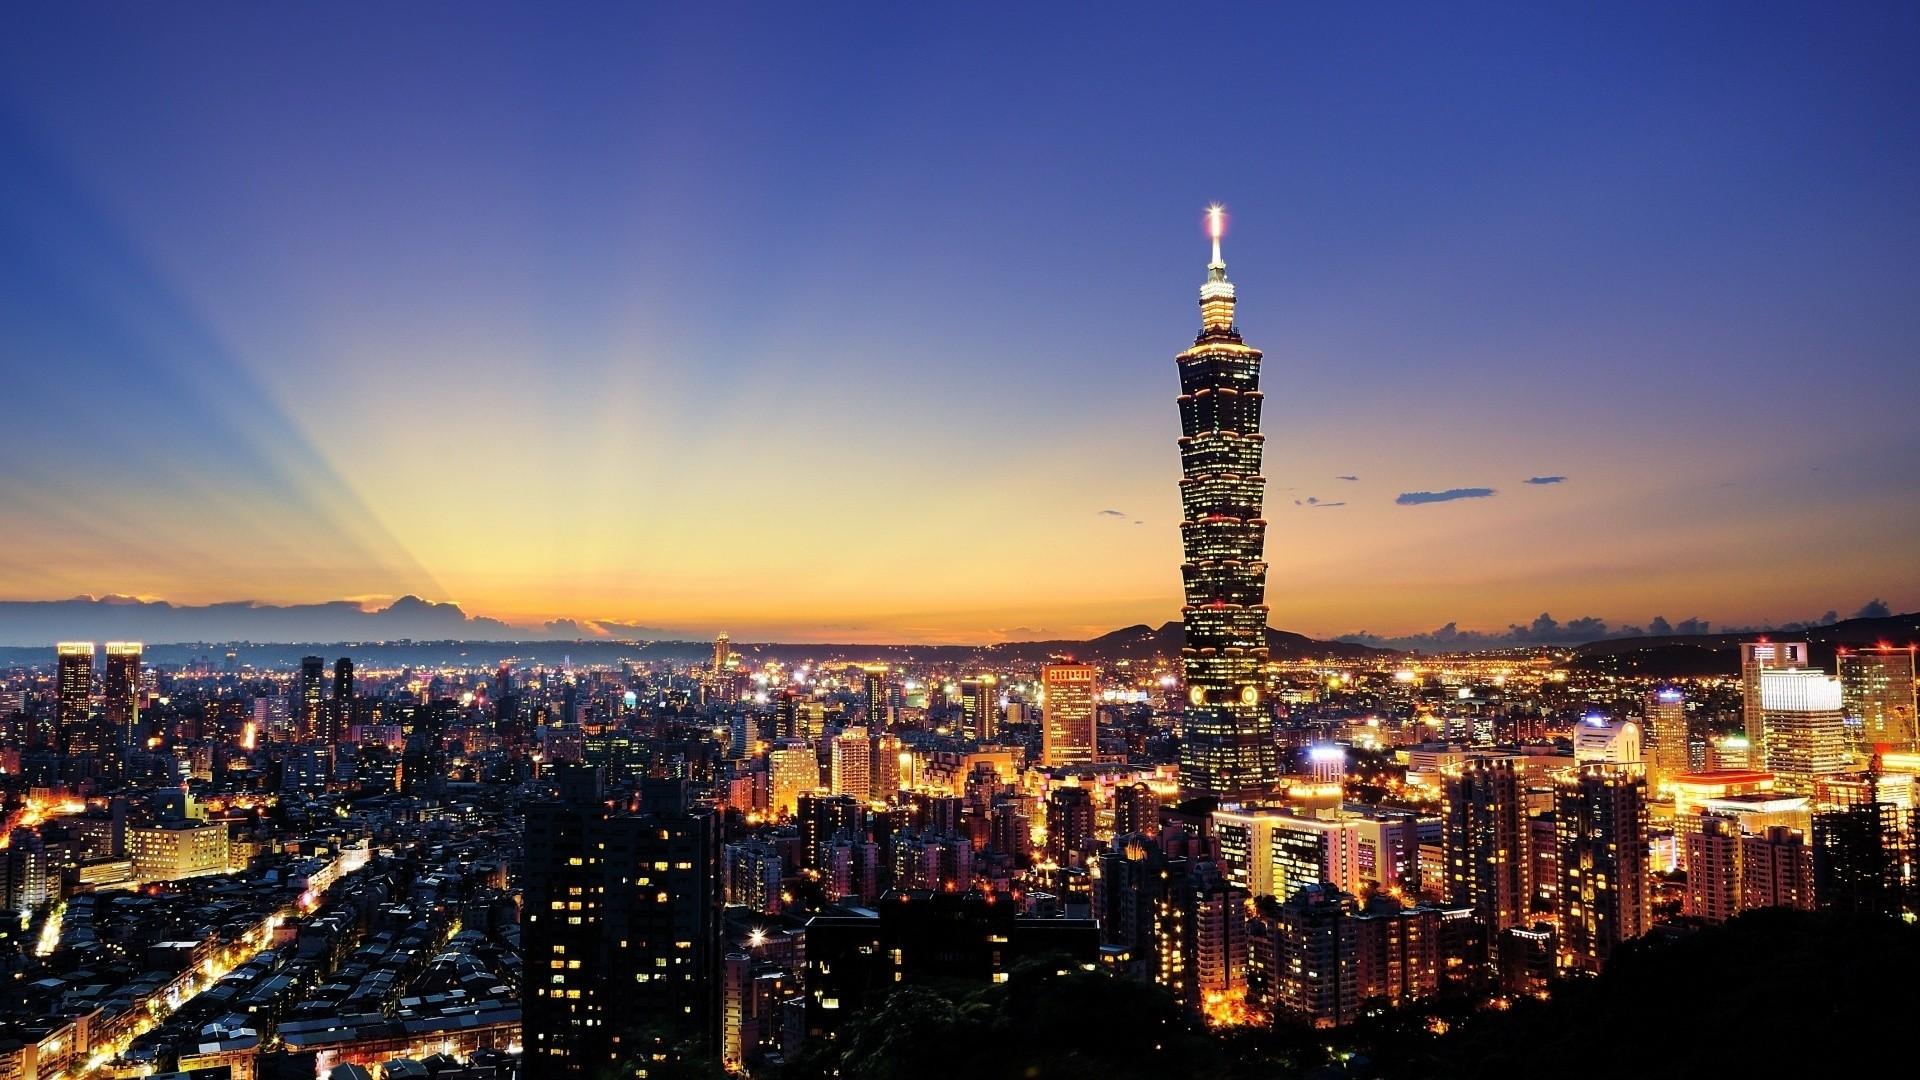 Wallpaper skyscrapers, city, night, lights